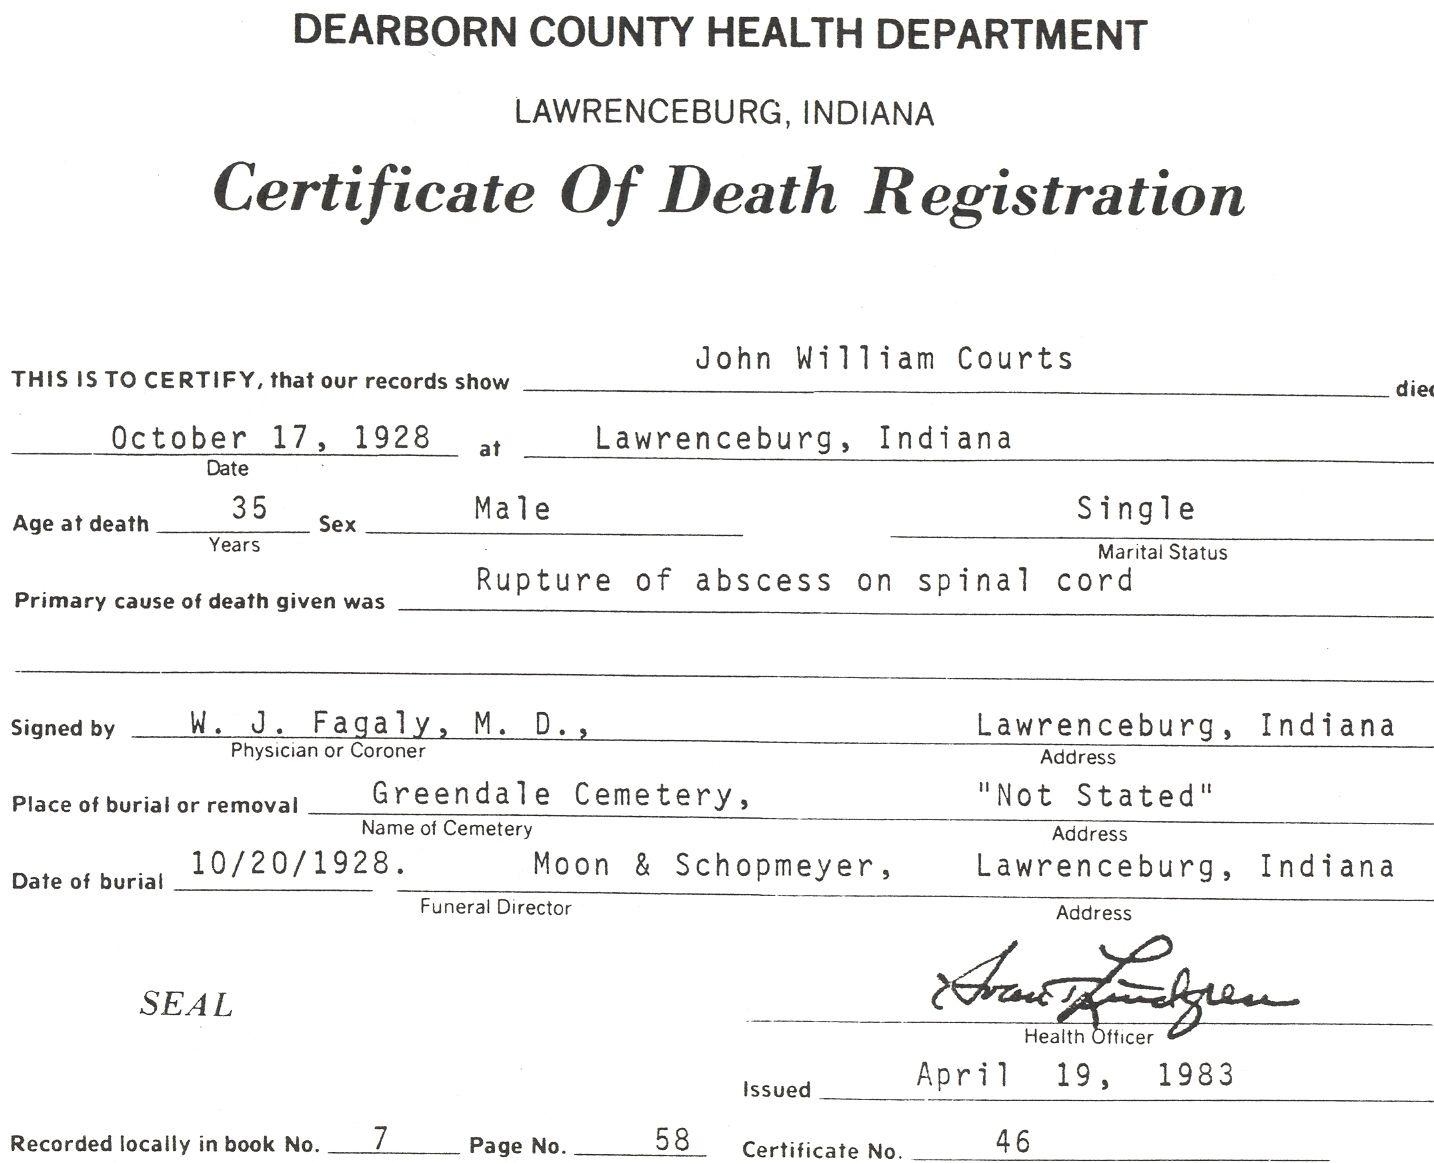 John William Courts Death Certificate. Son of William Henwood Courts ...